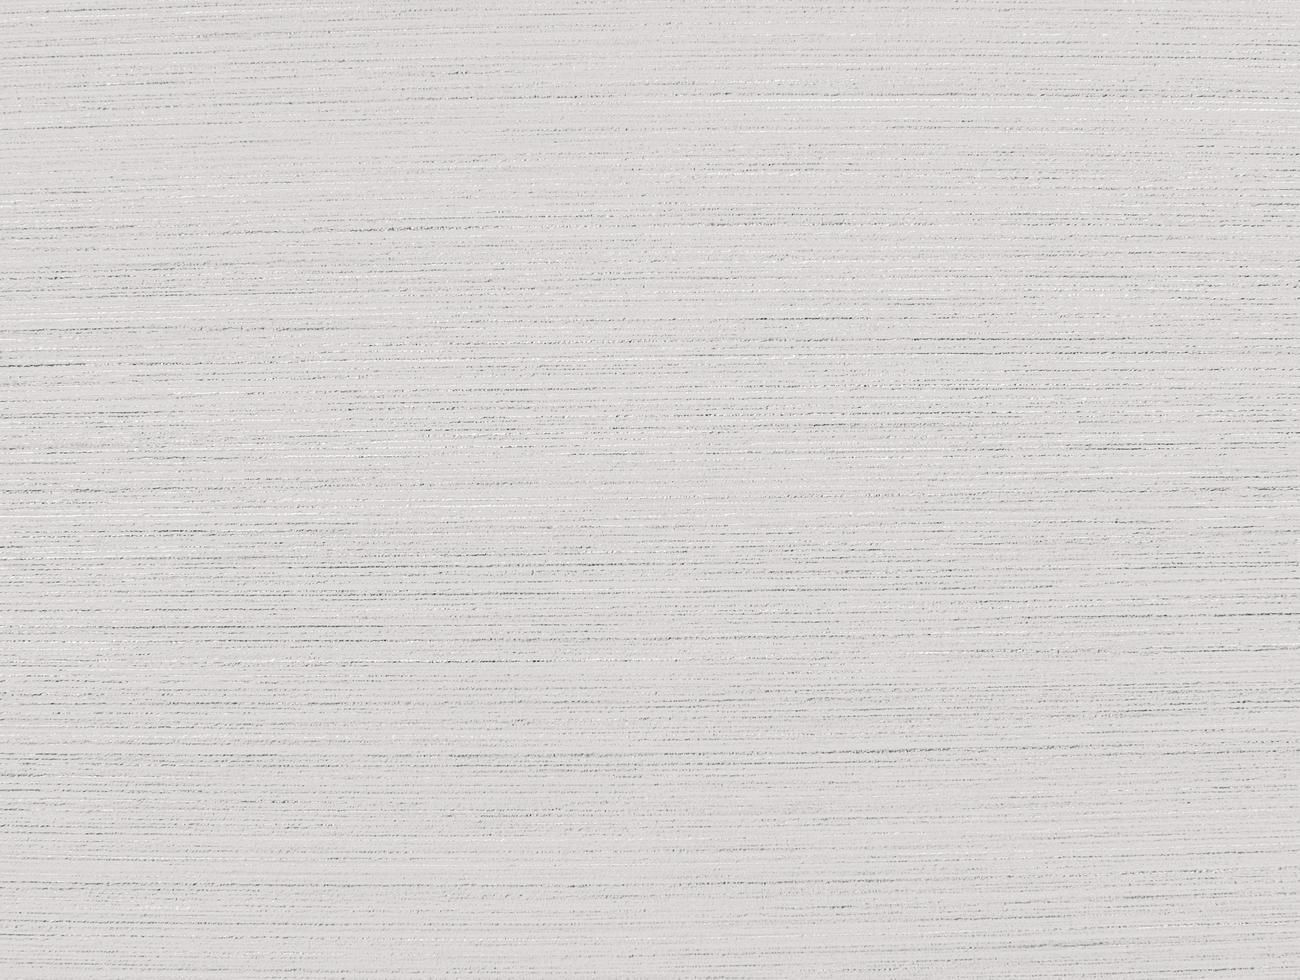 texture abstraite en acier oxyde photo